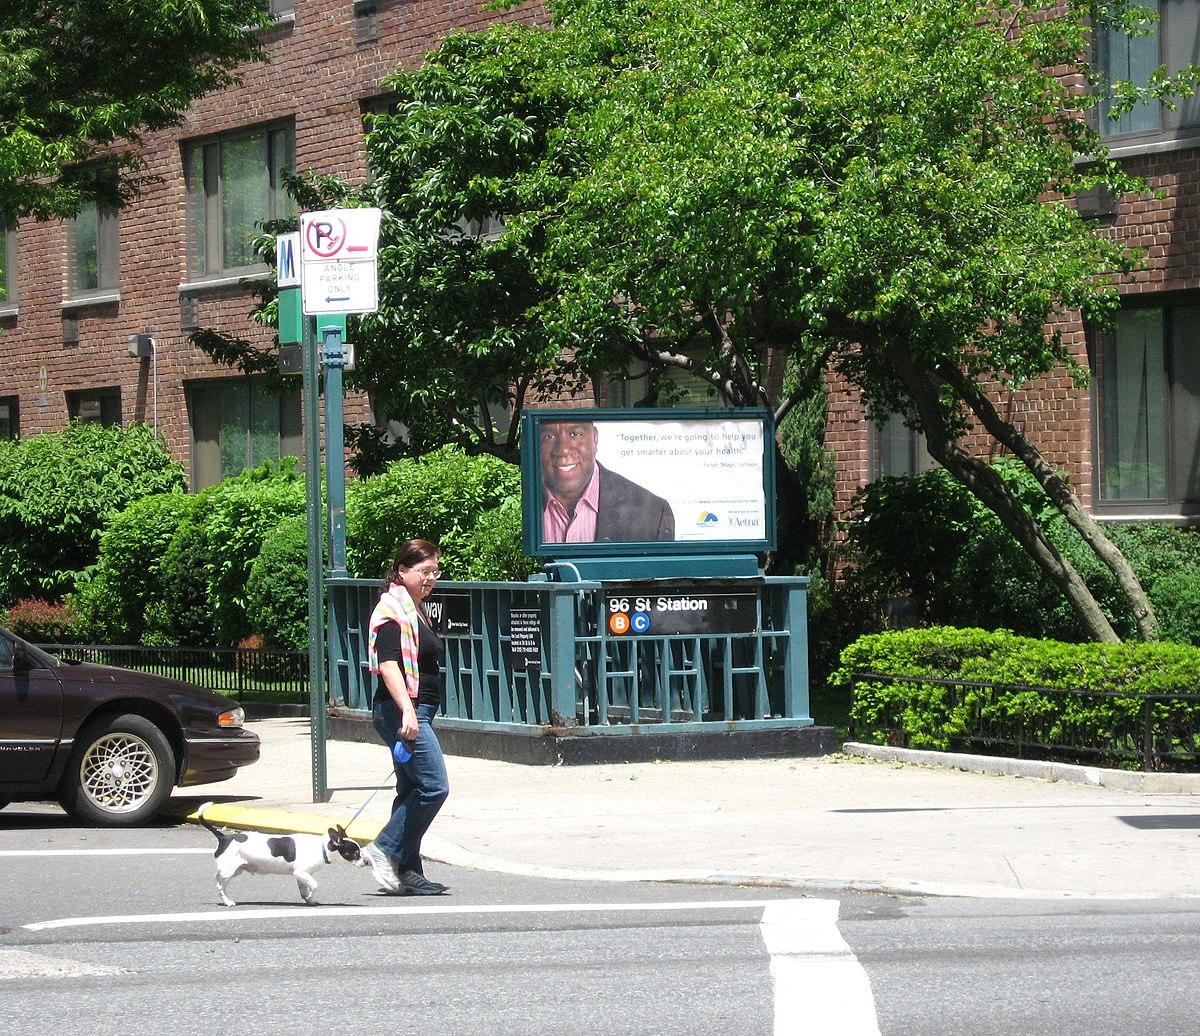 10 Manhattan Ave New York Ny 10025: 96th Street (IND Eighth Avenue Line)